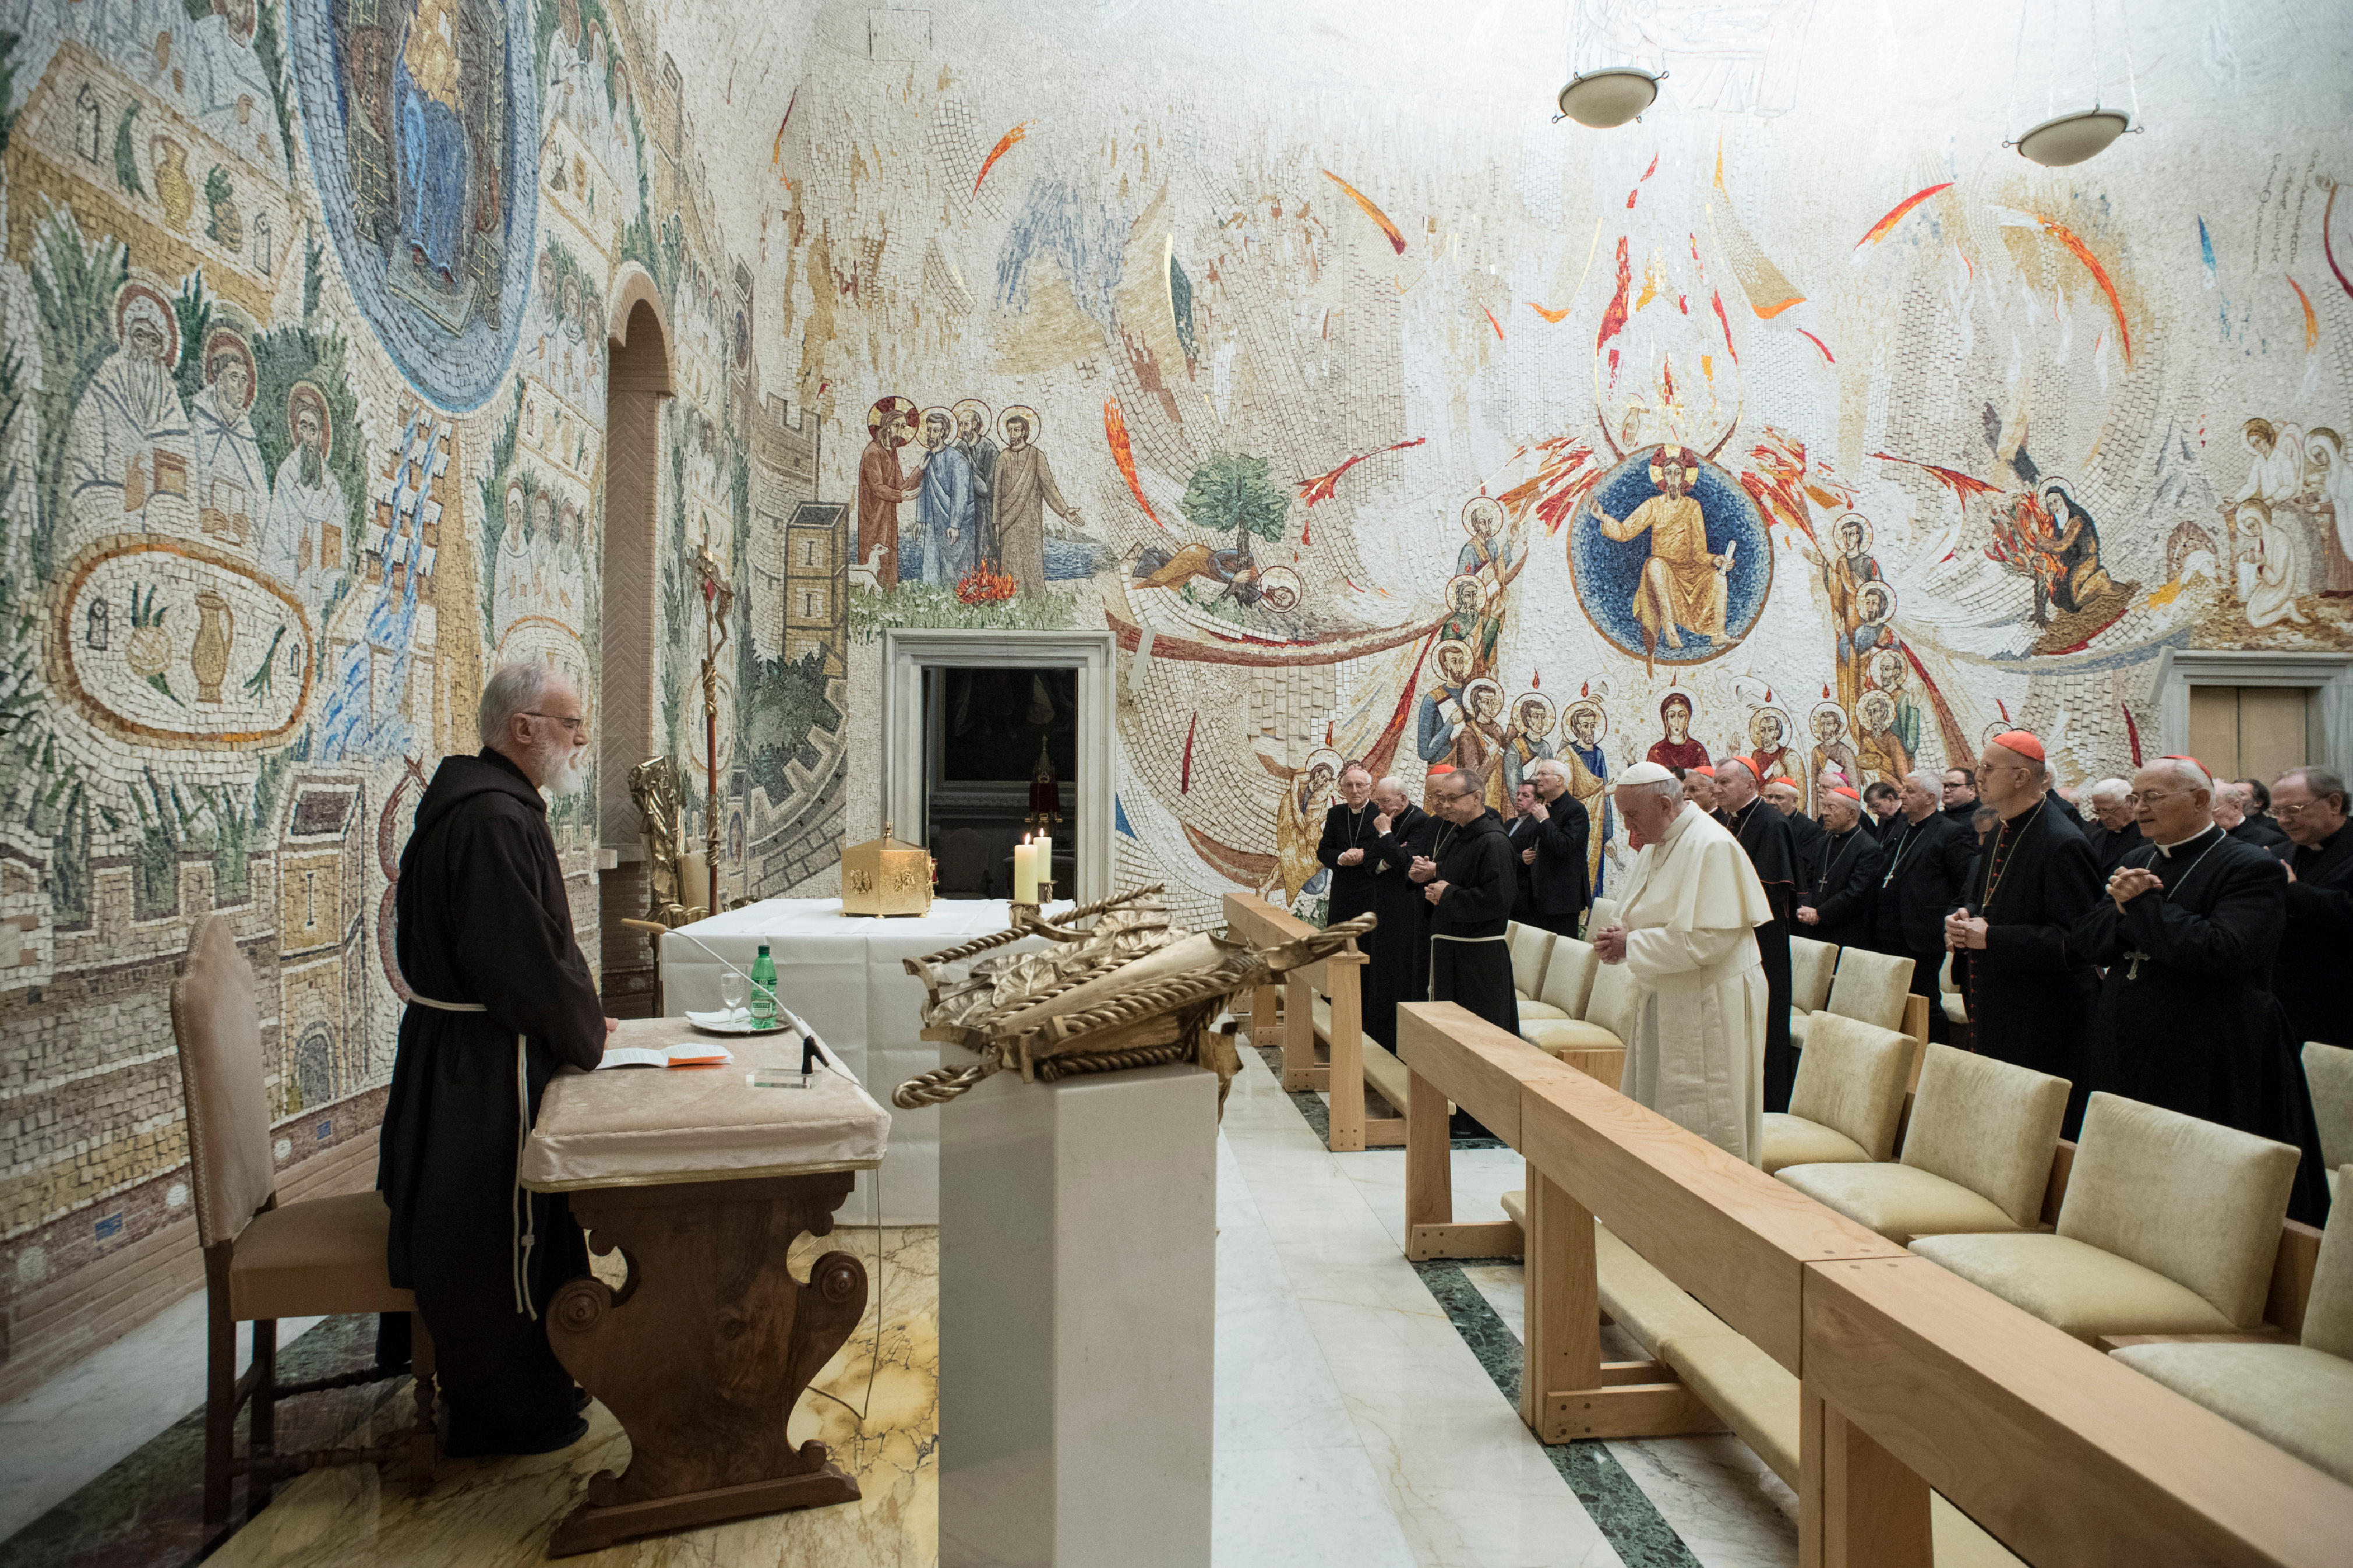 Prédication du p. Cantalamessa, Avent 2017 © L'Osservatore Romano